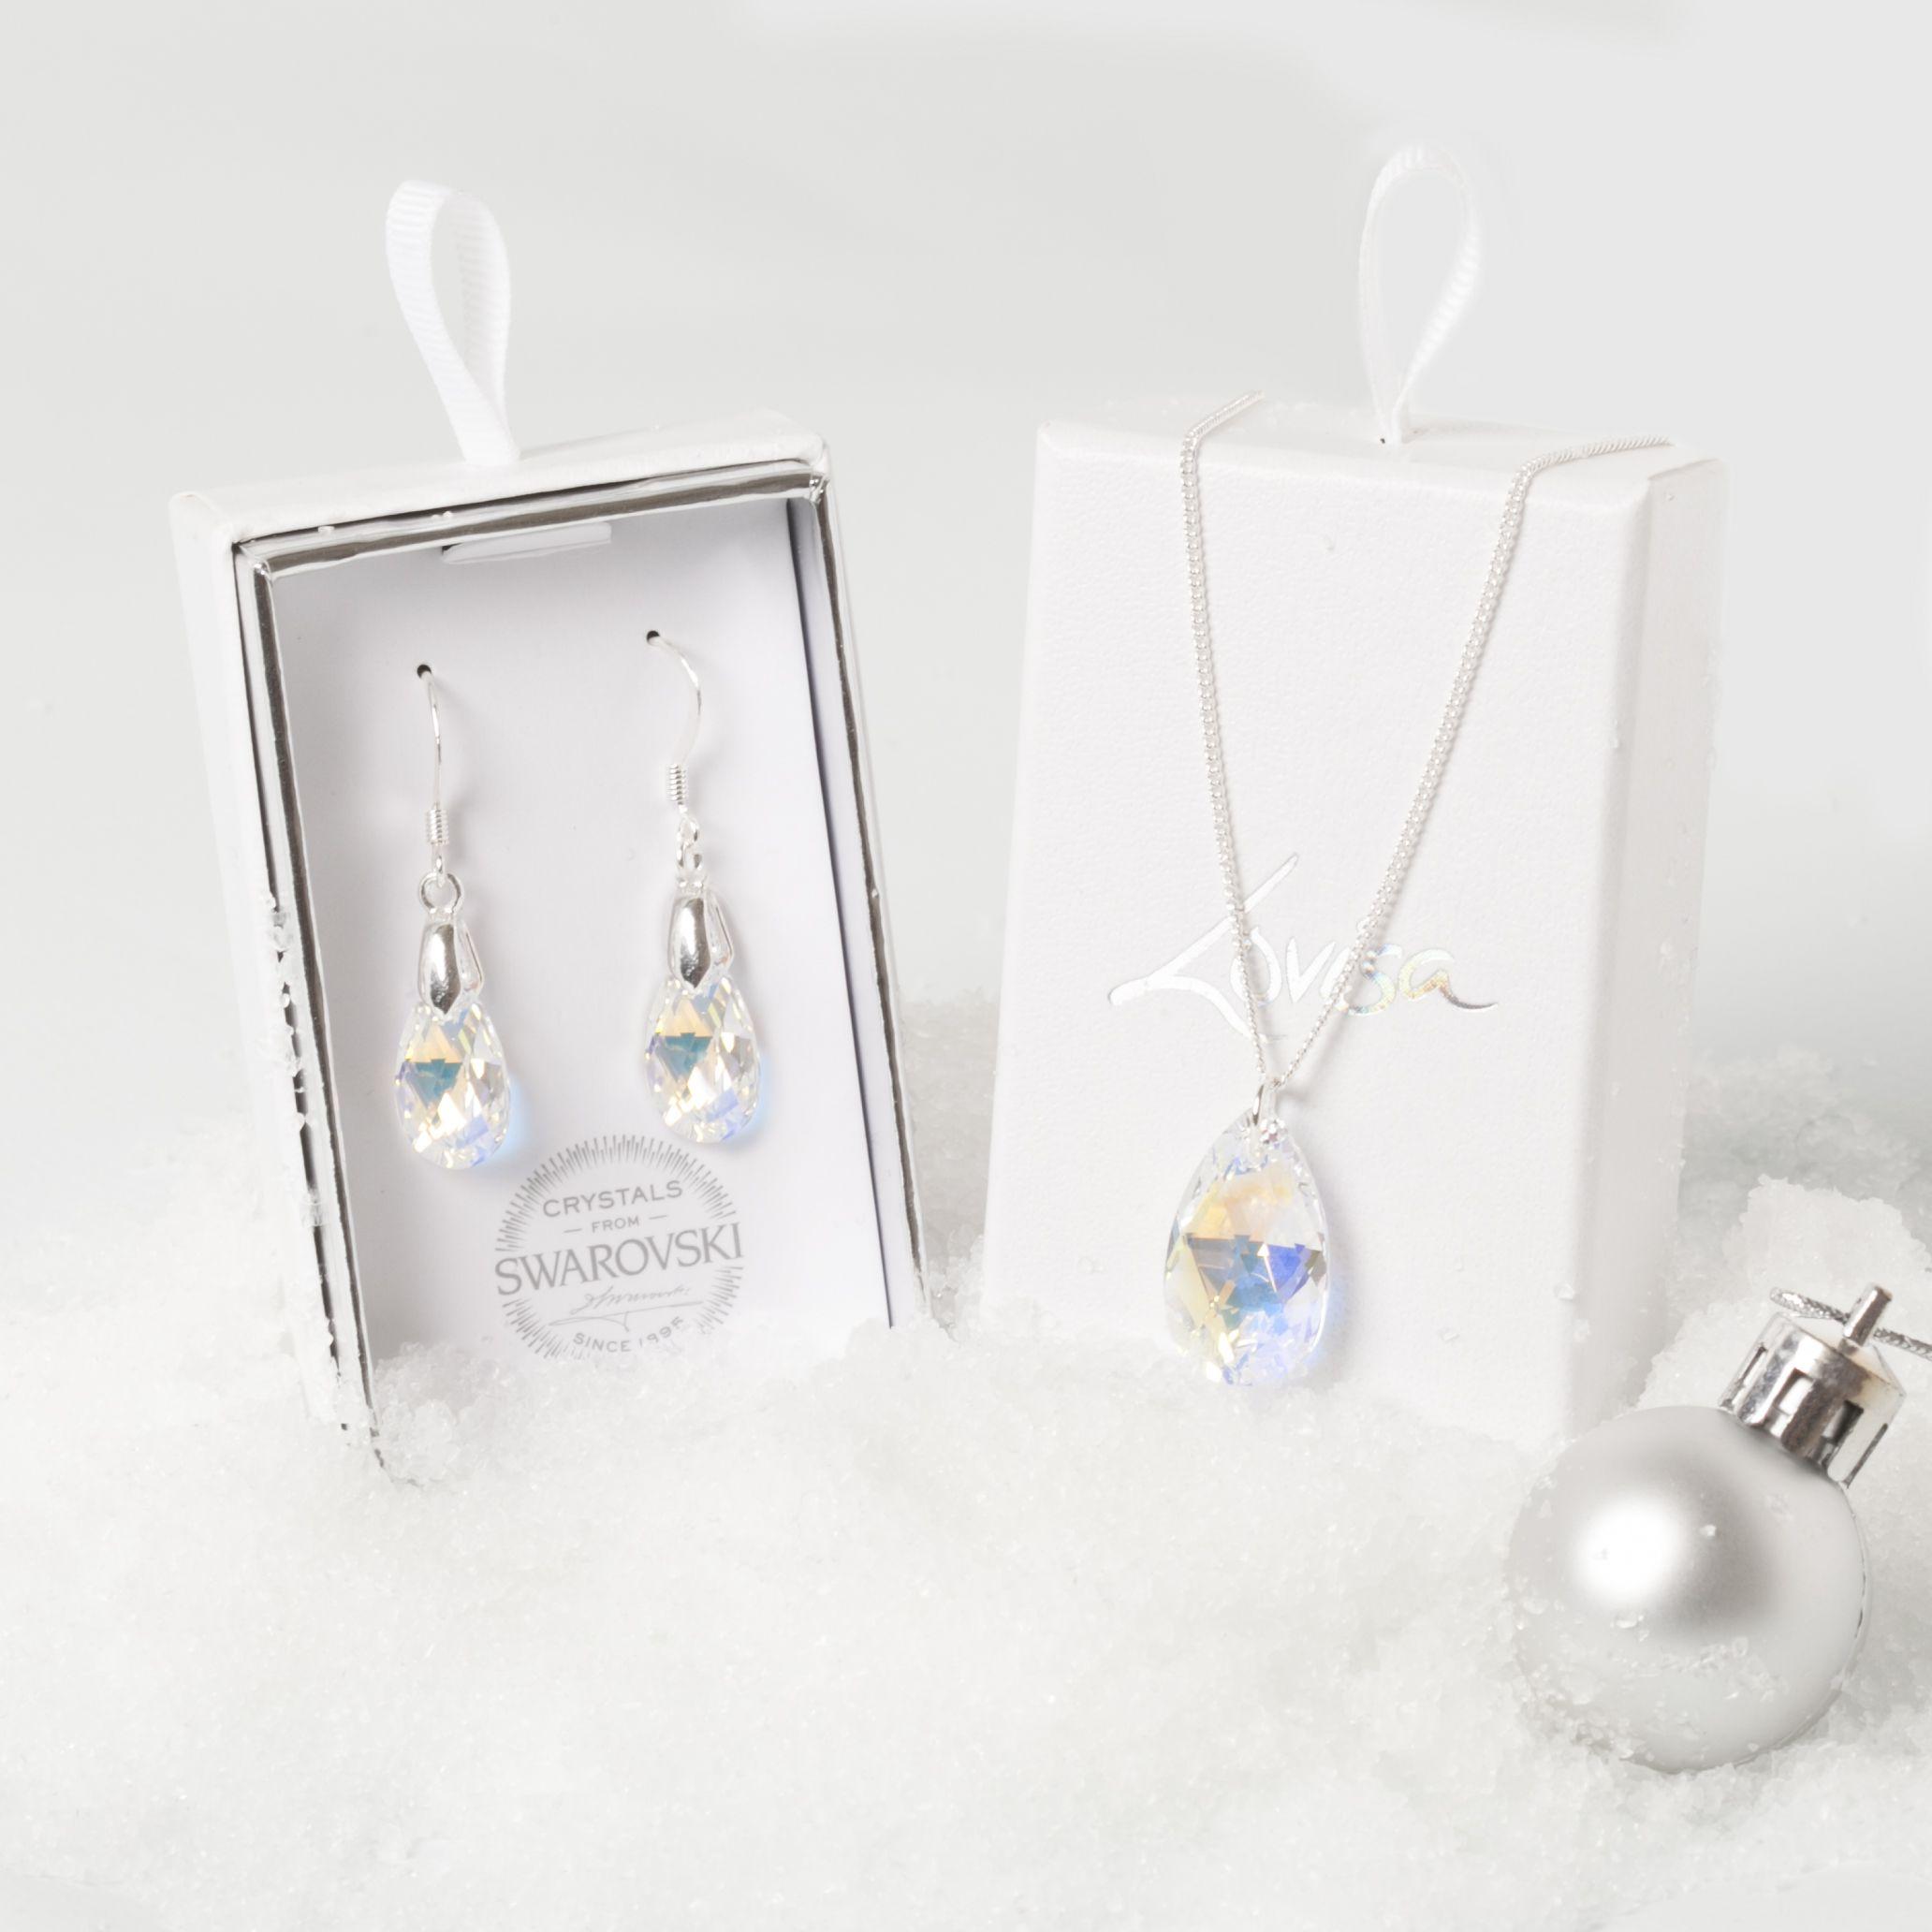 afef5efda lovisa #swarovski #gift #giftidea #christmas #jewellery #love ...